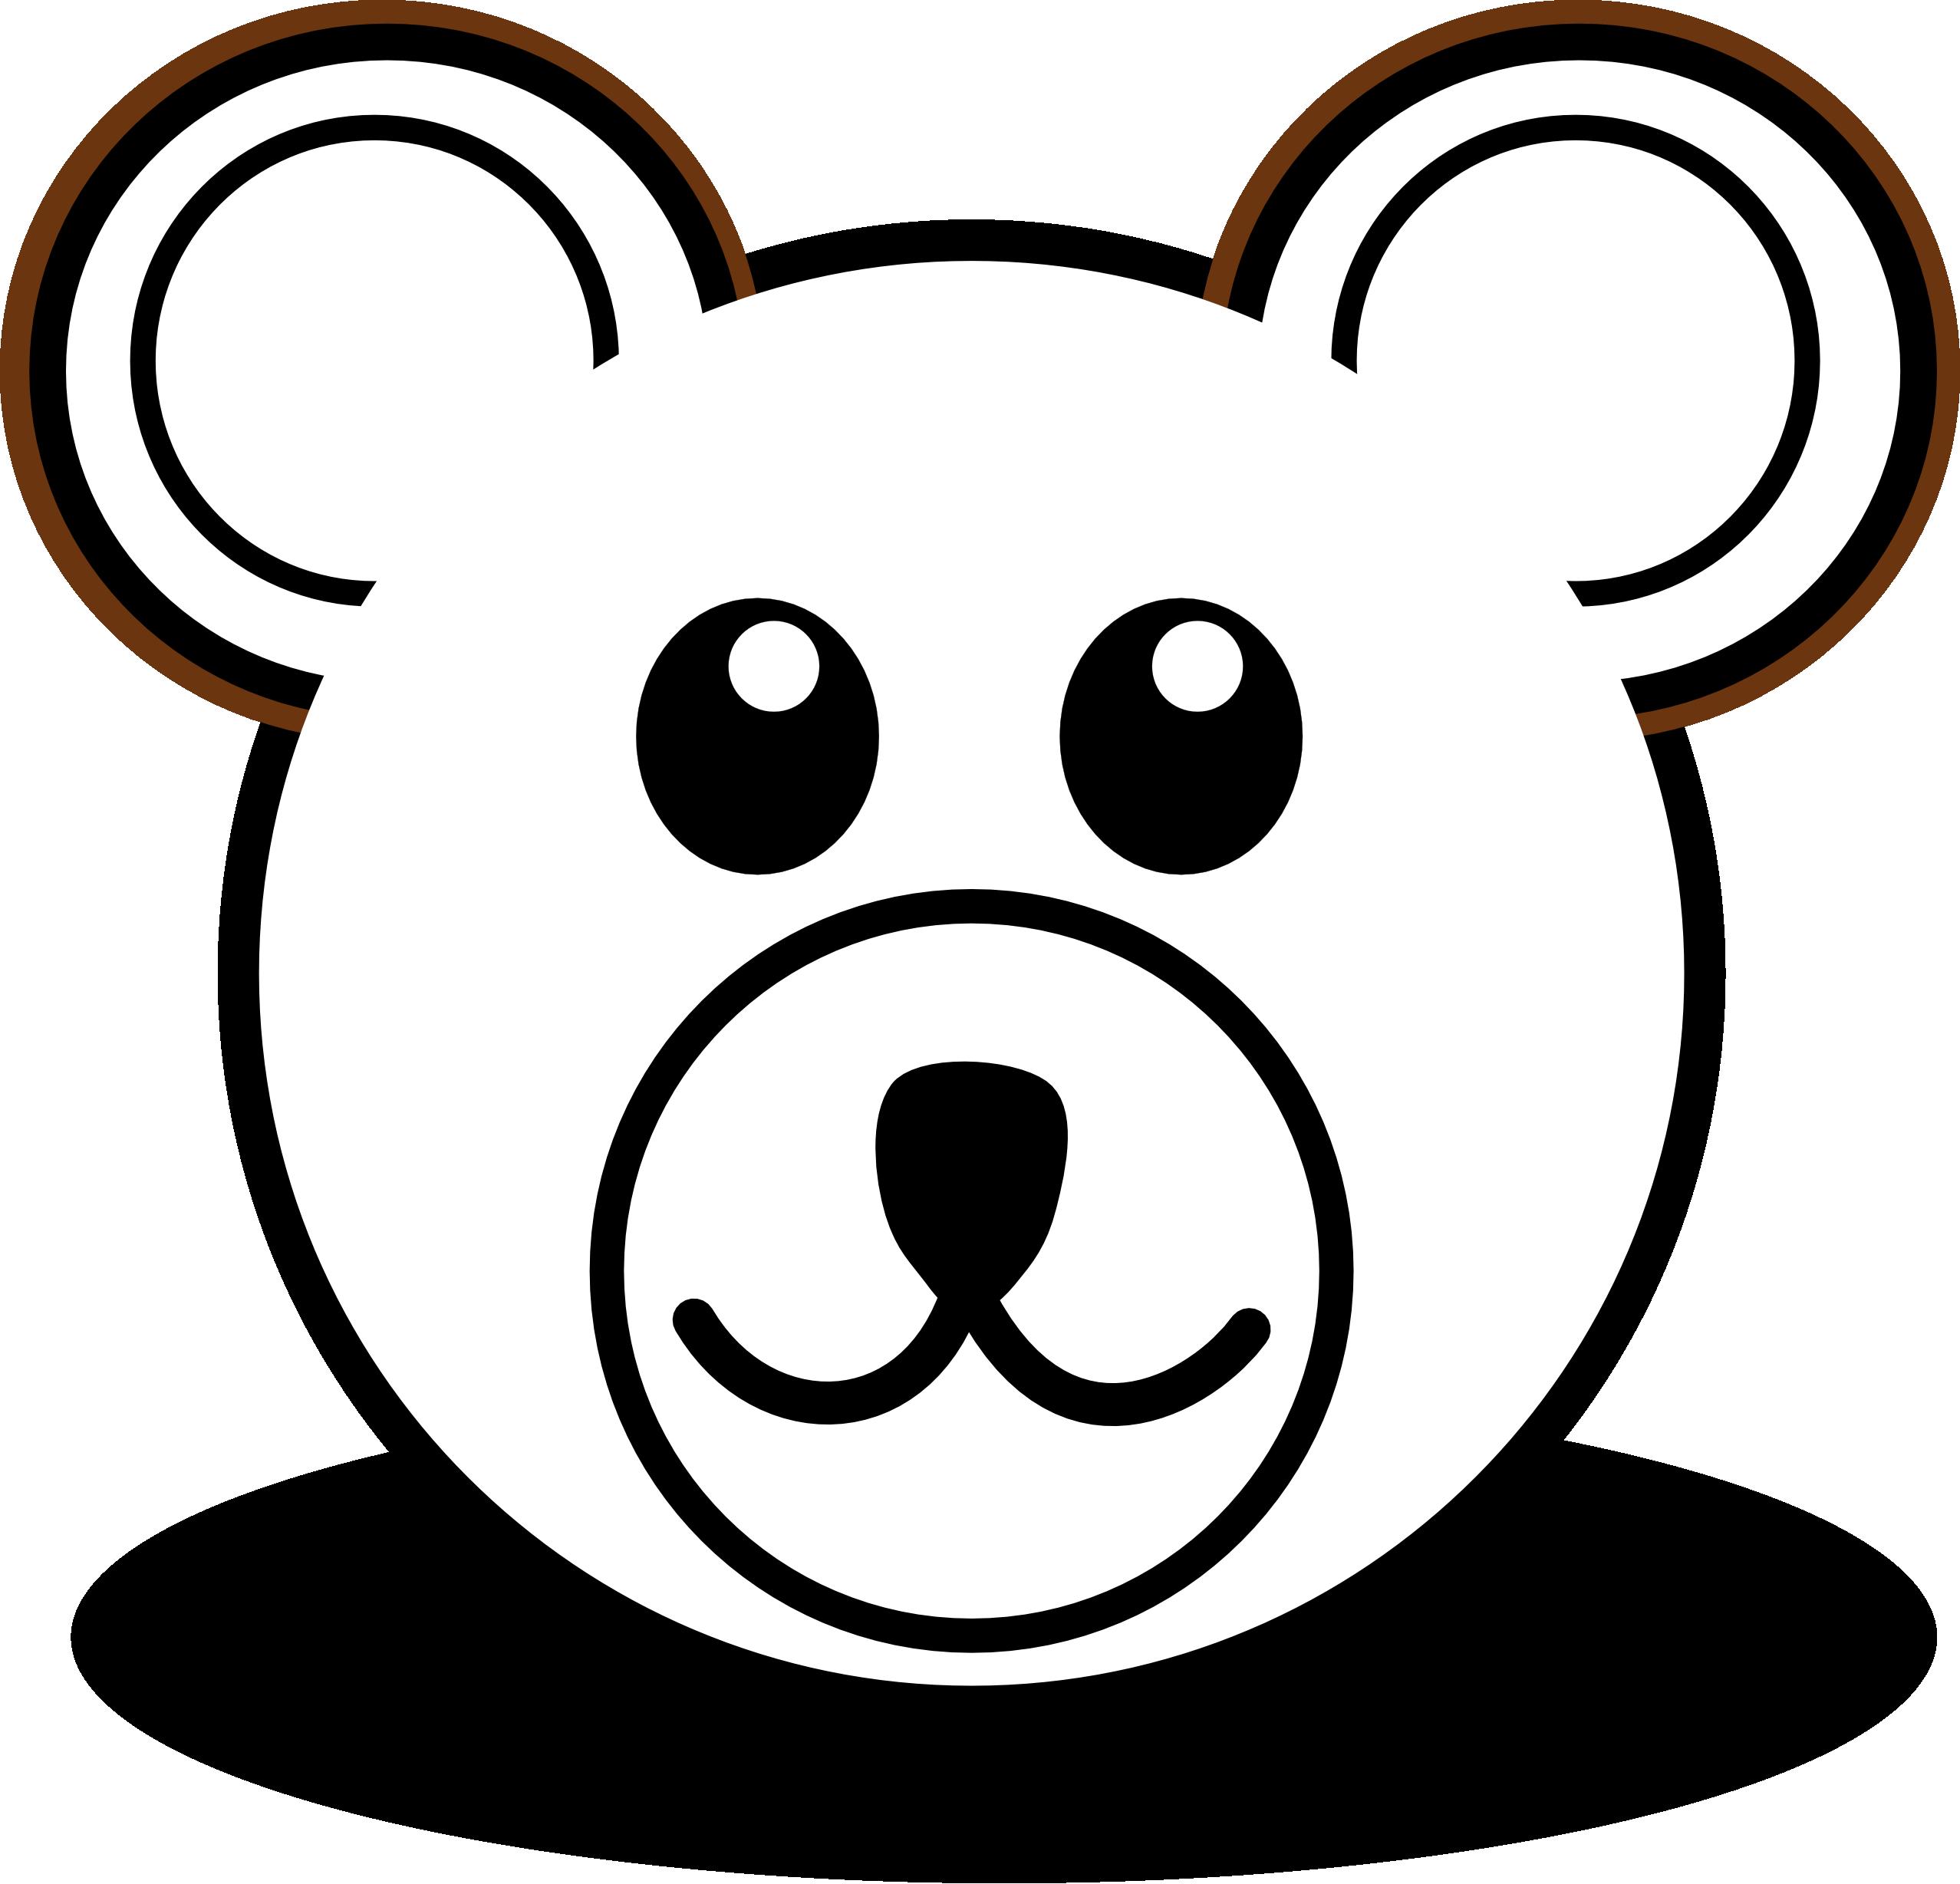 Teddy bear teddybearoutlineclipartlipartclipartcoloringbookcolouringpxpng . Clipart mom outline